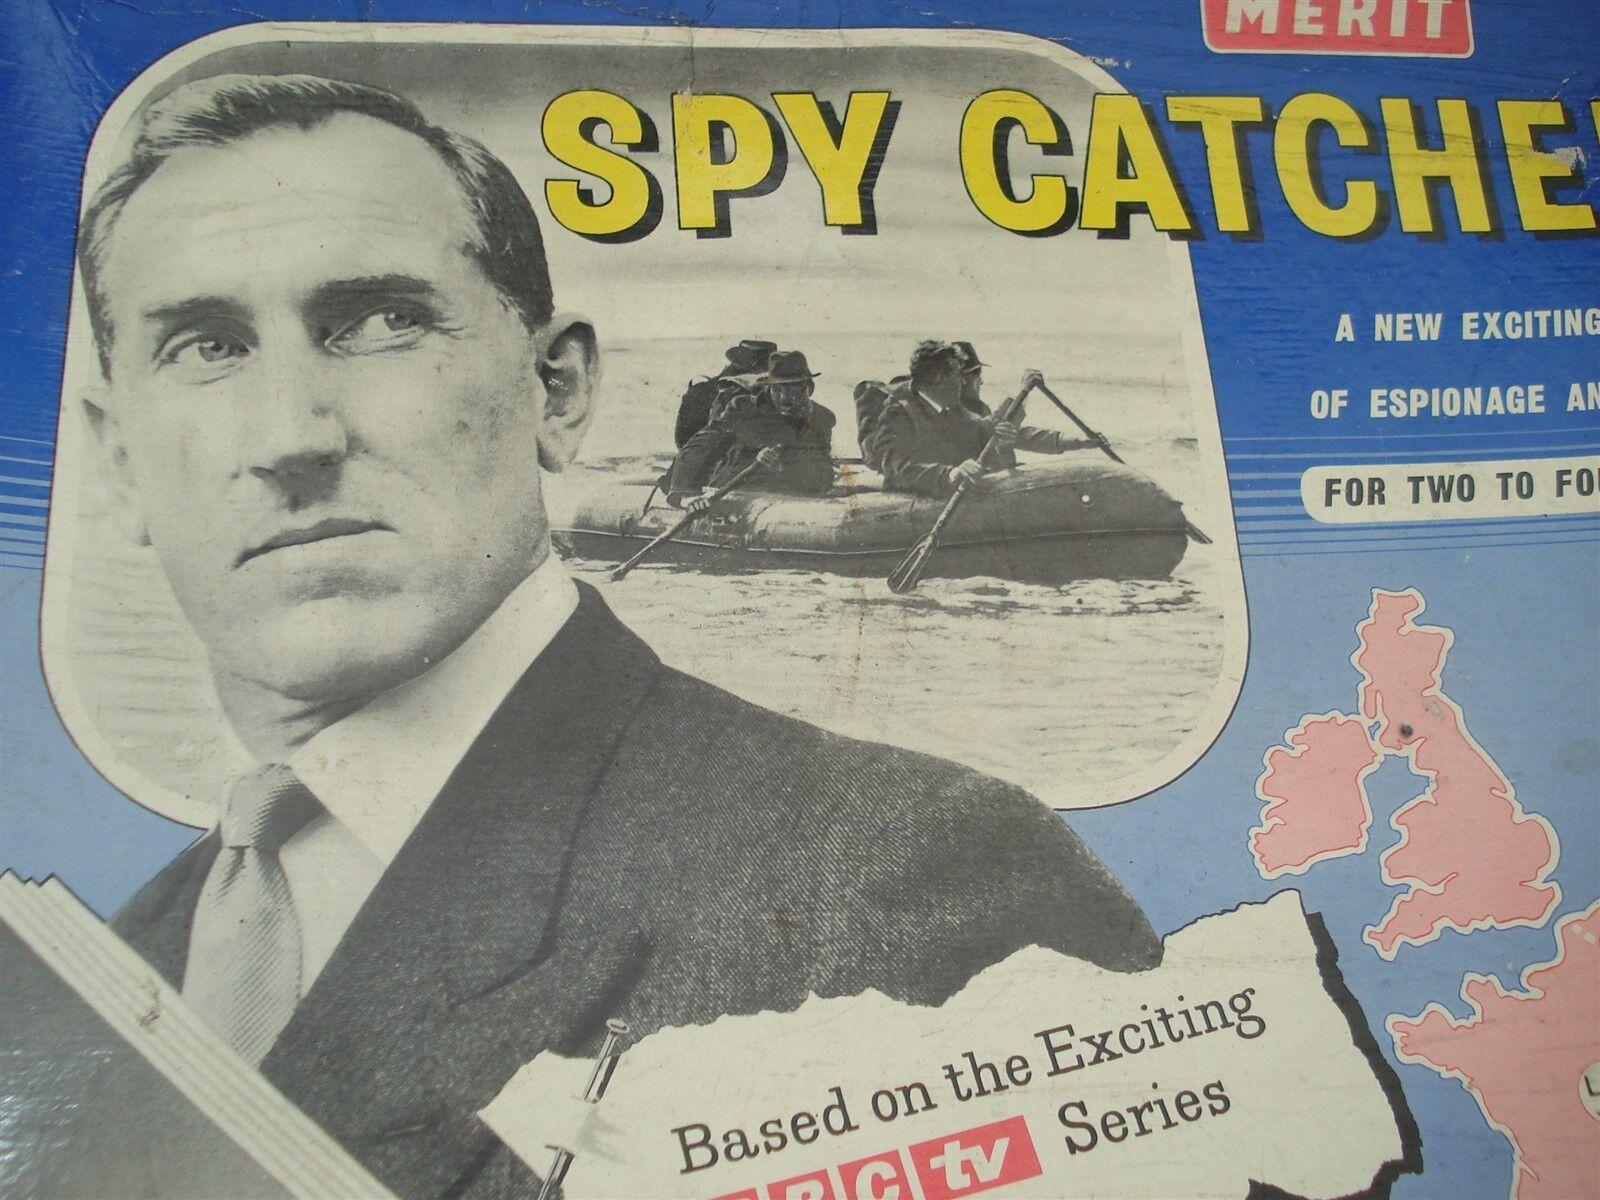 SPY CATCHER GAME - MERIT - 100% - VERY GOOD ORDER - SPYCATCHER - 1950'S ERA